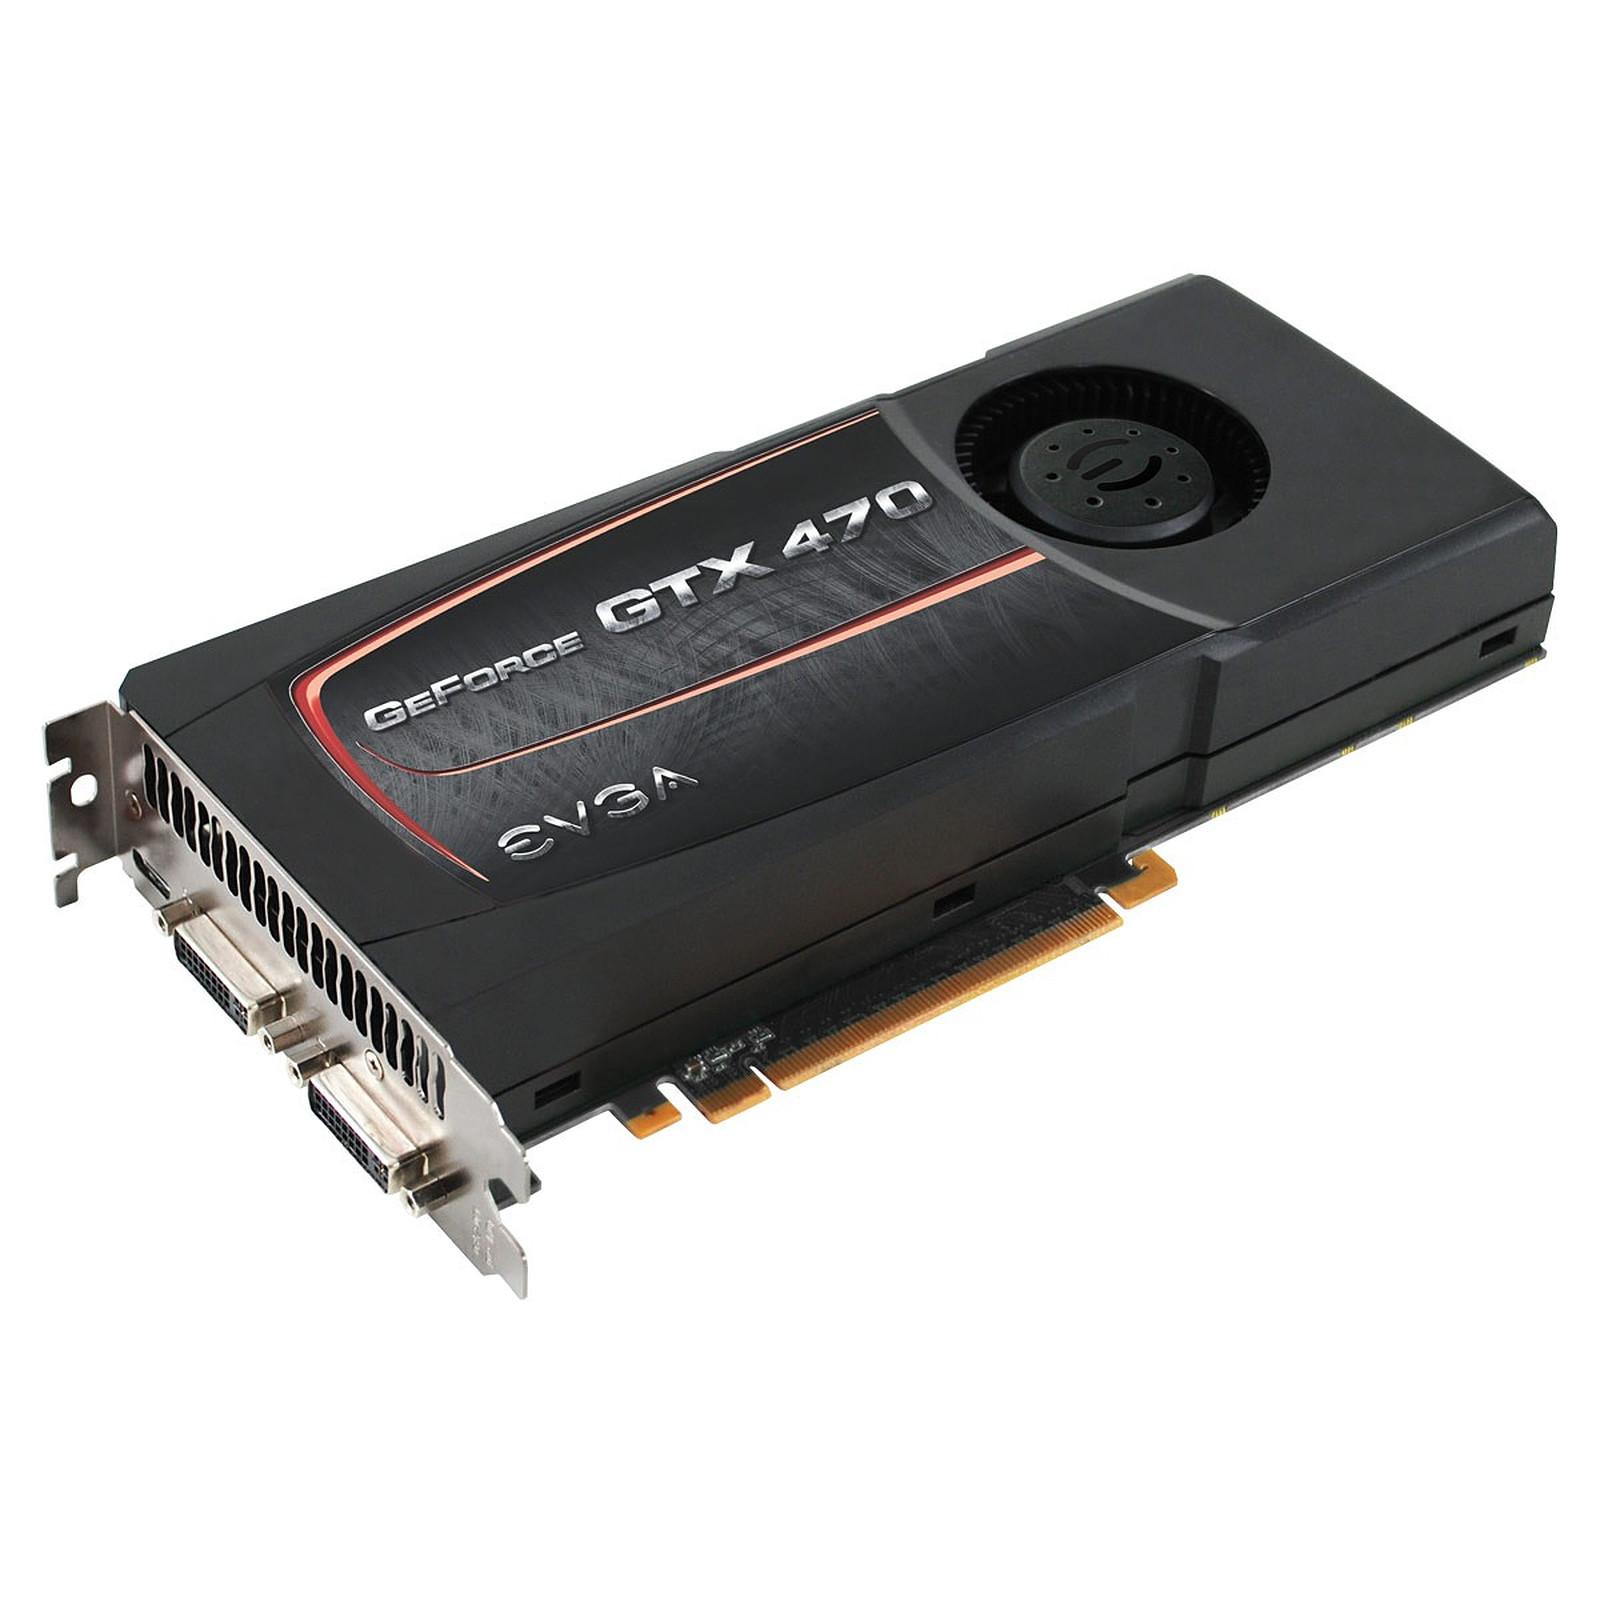 EVGA GeForce GTX 470 SuperClocked 1280 MB